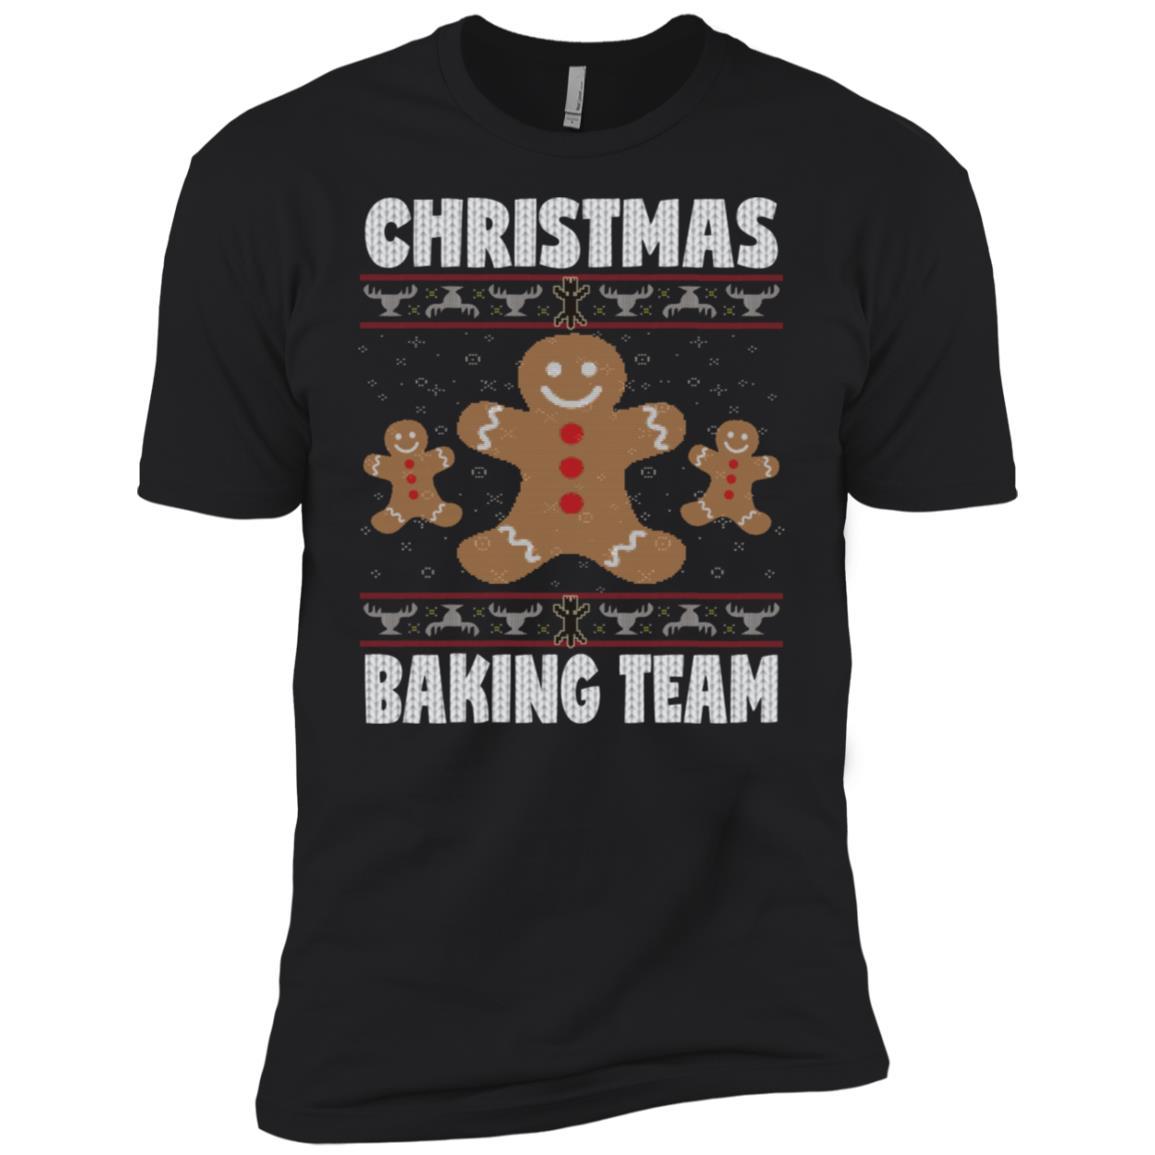 Christmas Baking Team Funny Ugly Sweater Xmas Gift Men Short Sleeve T-Shirt